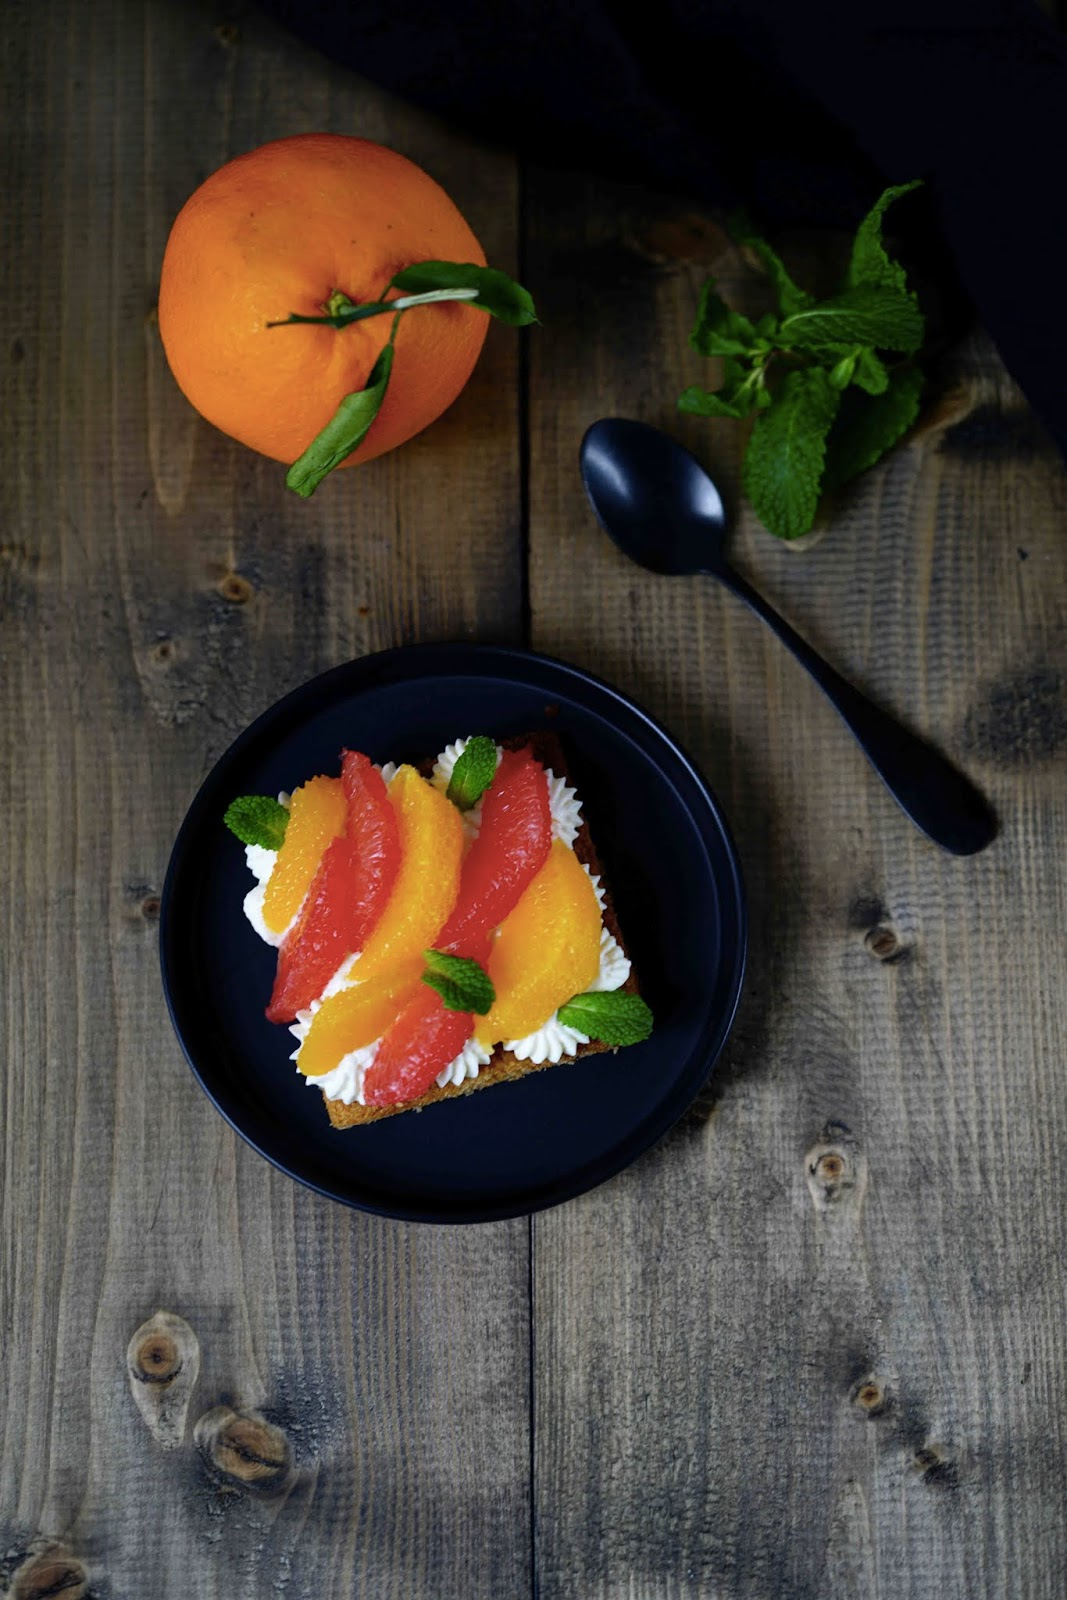 chantilly mascarpone, recette facile ,dessert rapide , agrumes